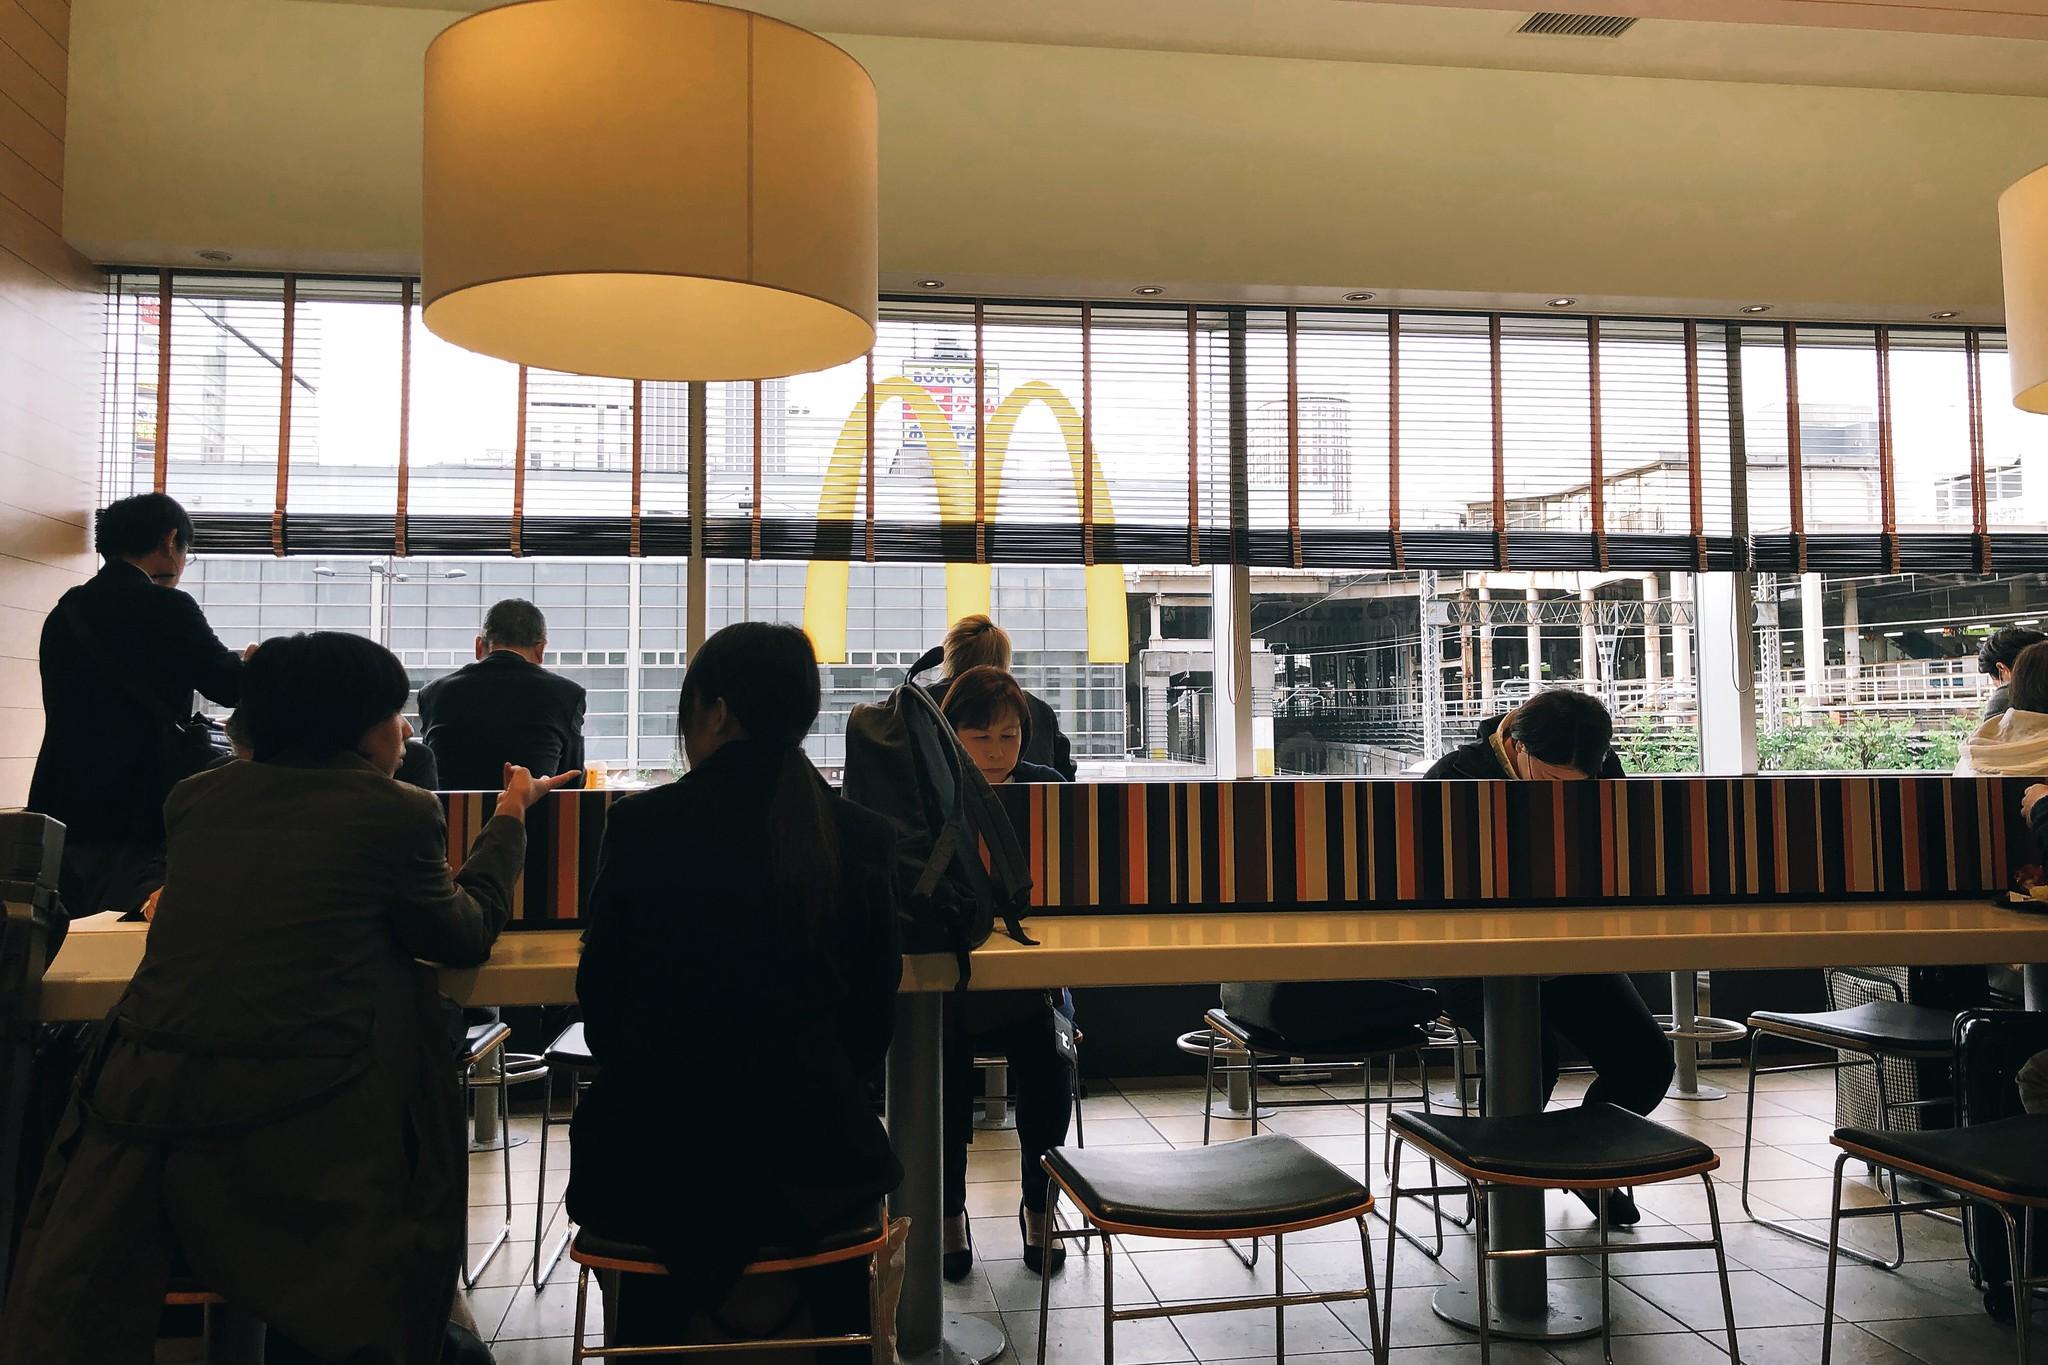 Morning in Macdonald. #iPhoneX #Shotoniphone #Apple #RNIFilms #FujiSuperia400 #Tokyo